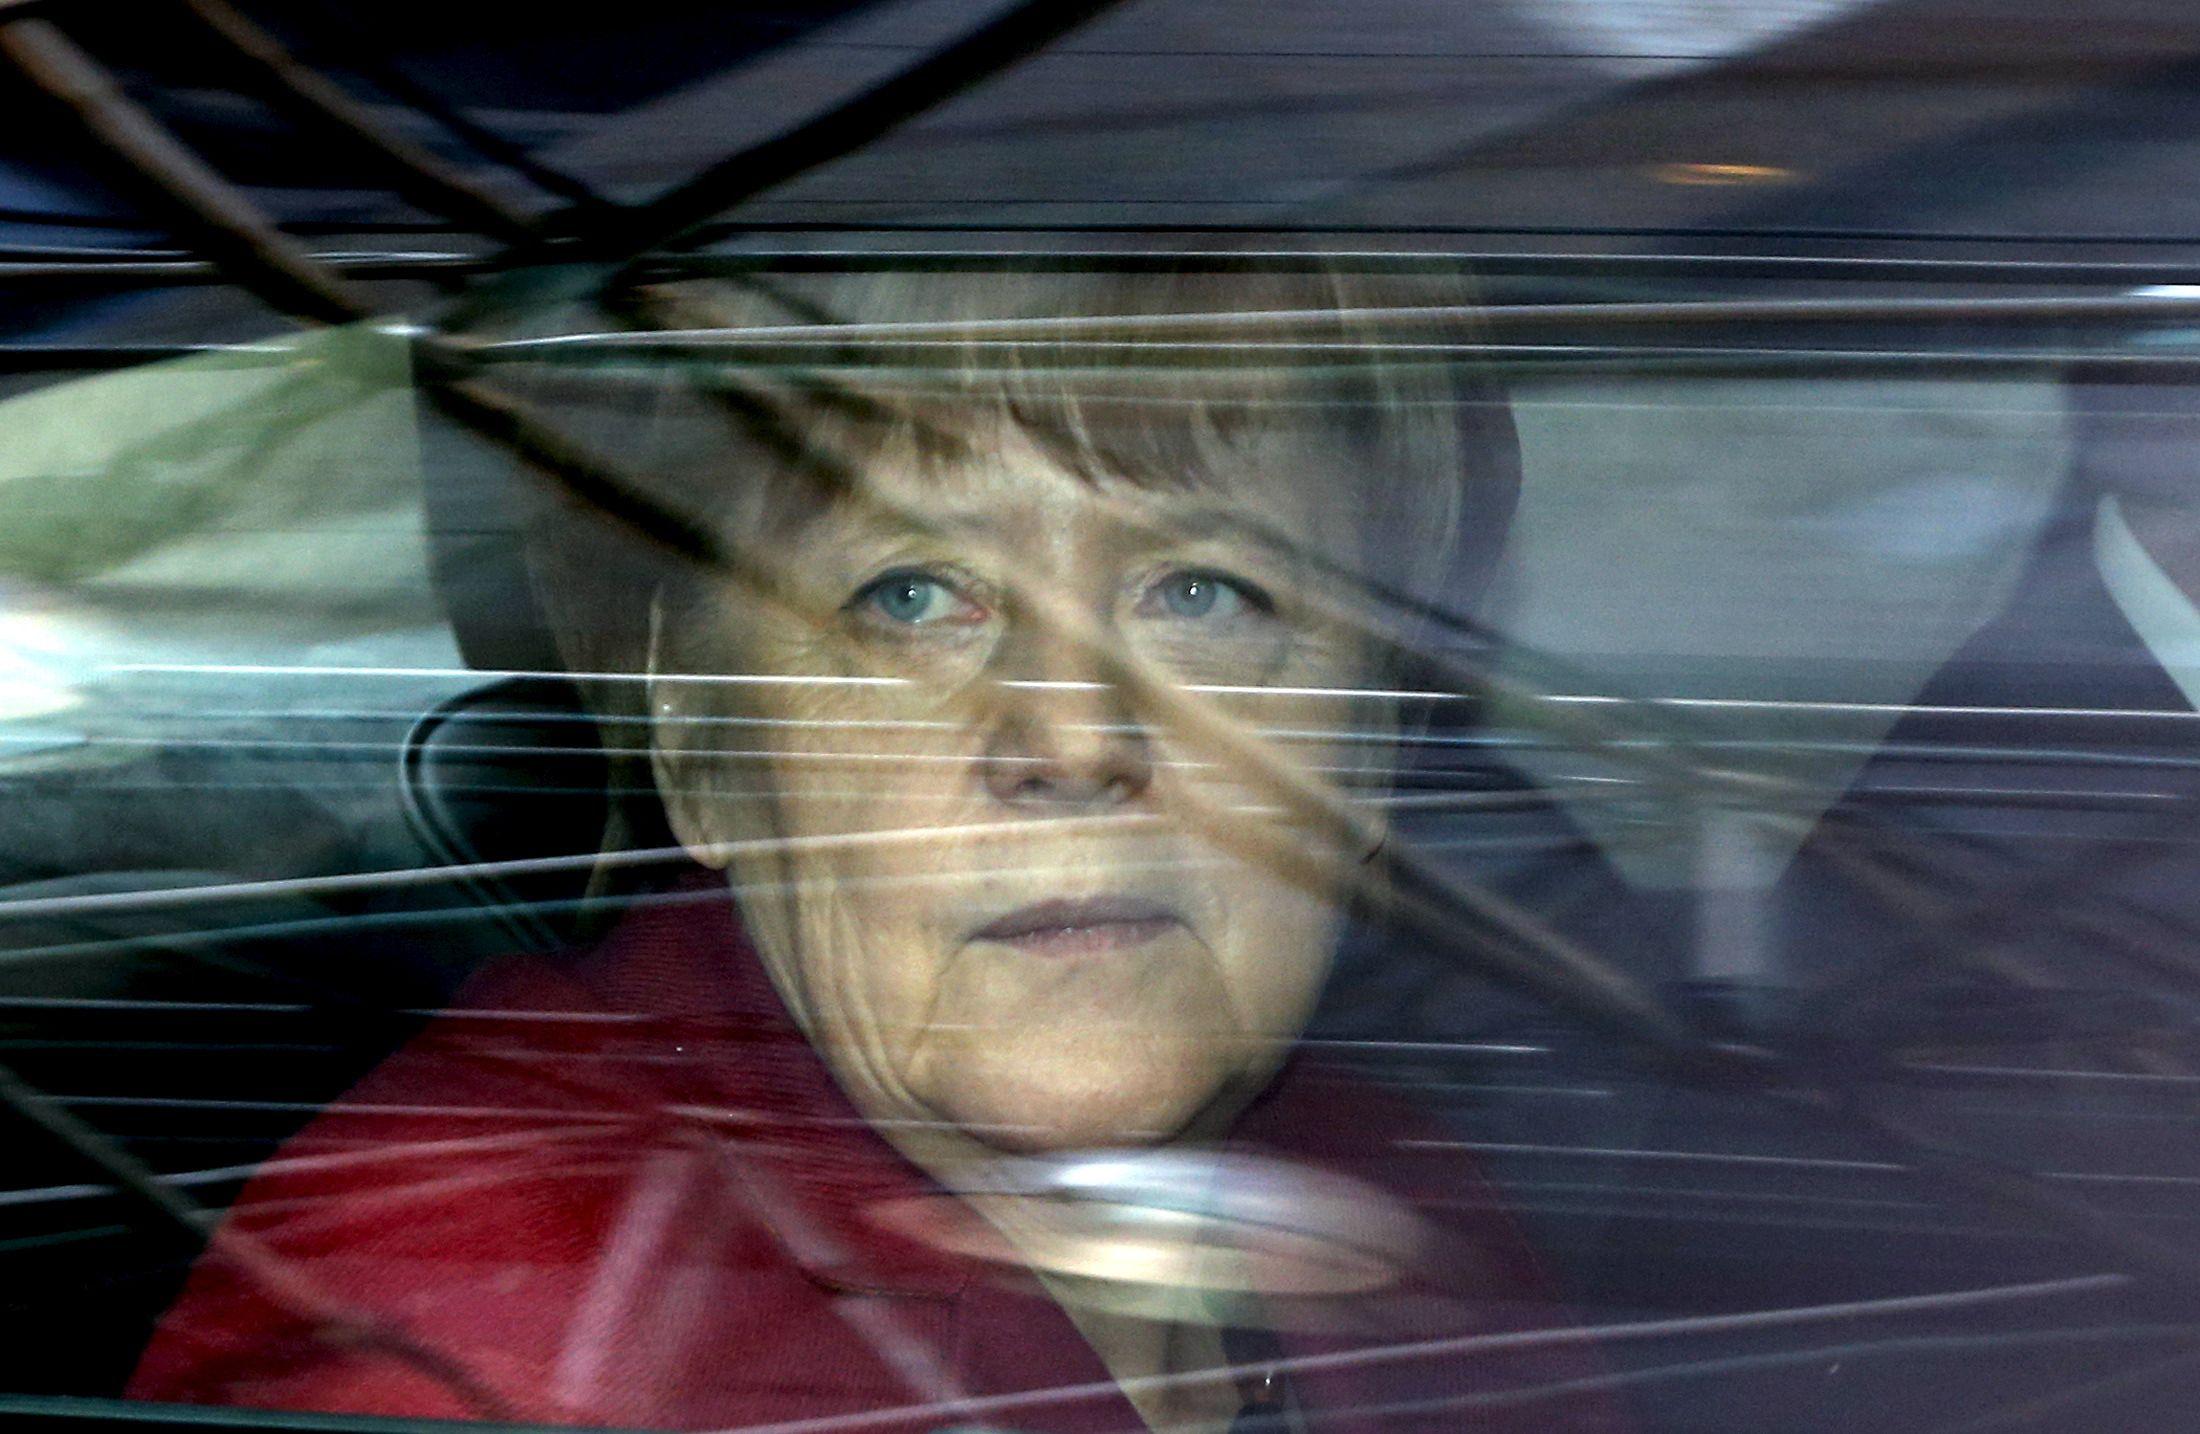 17/03/2016_Angela Merkel